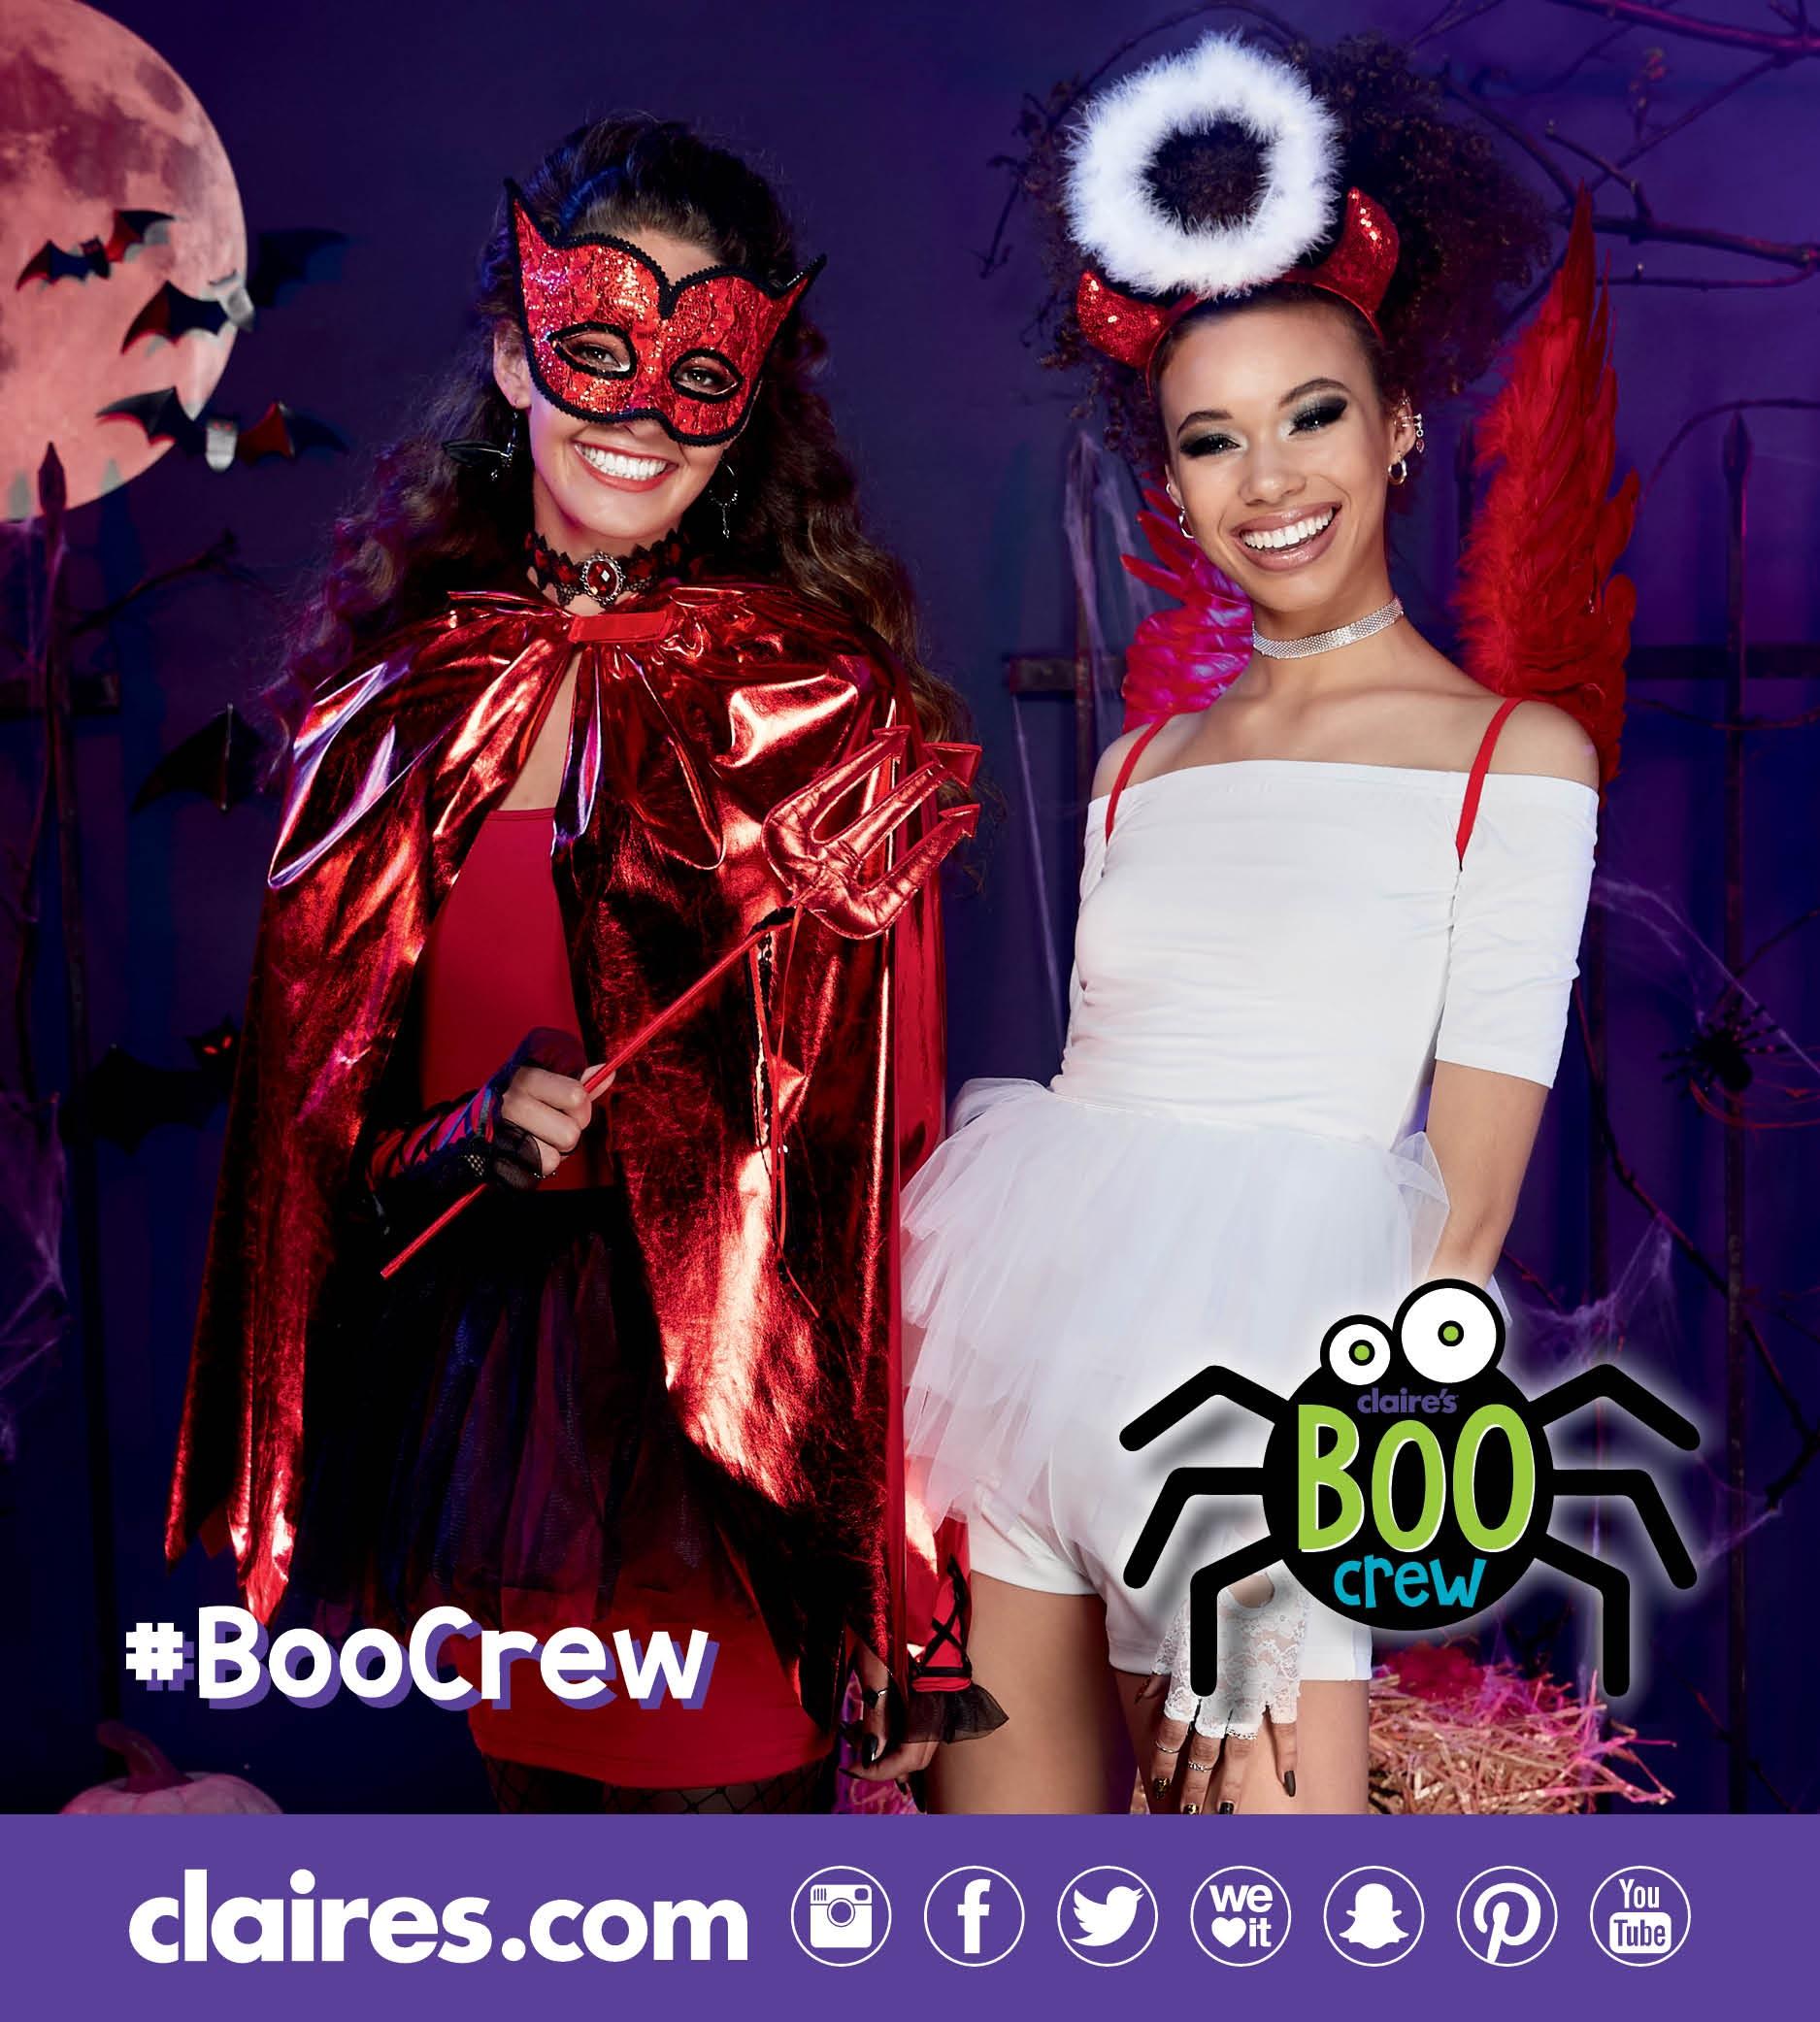 claire's halloween costumes